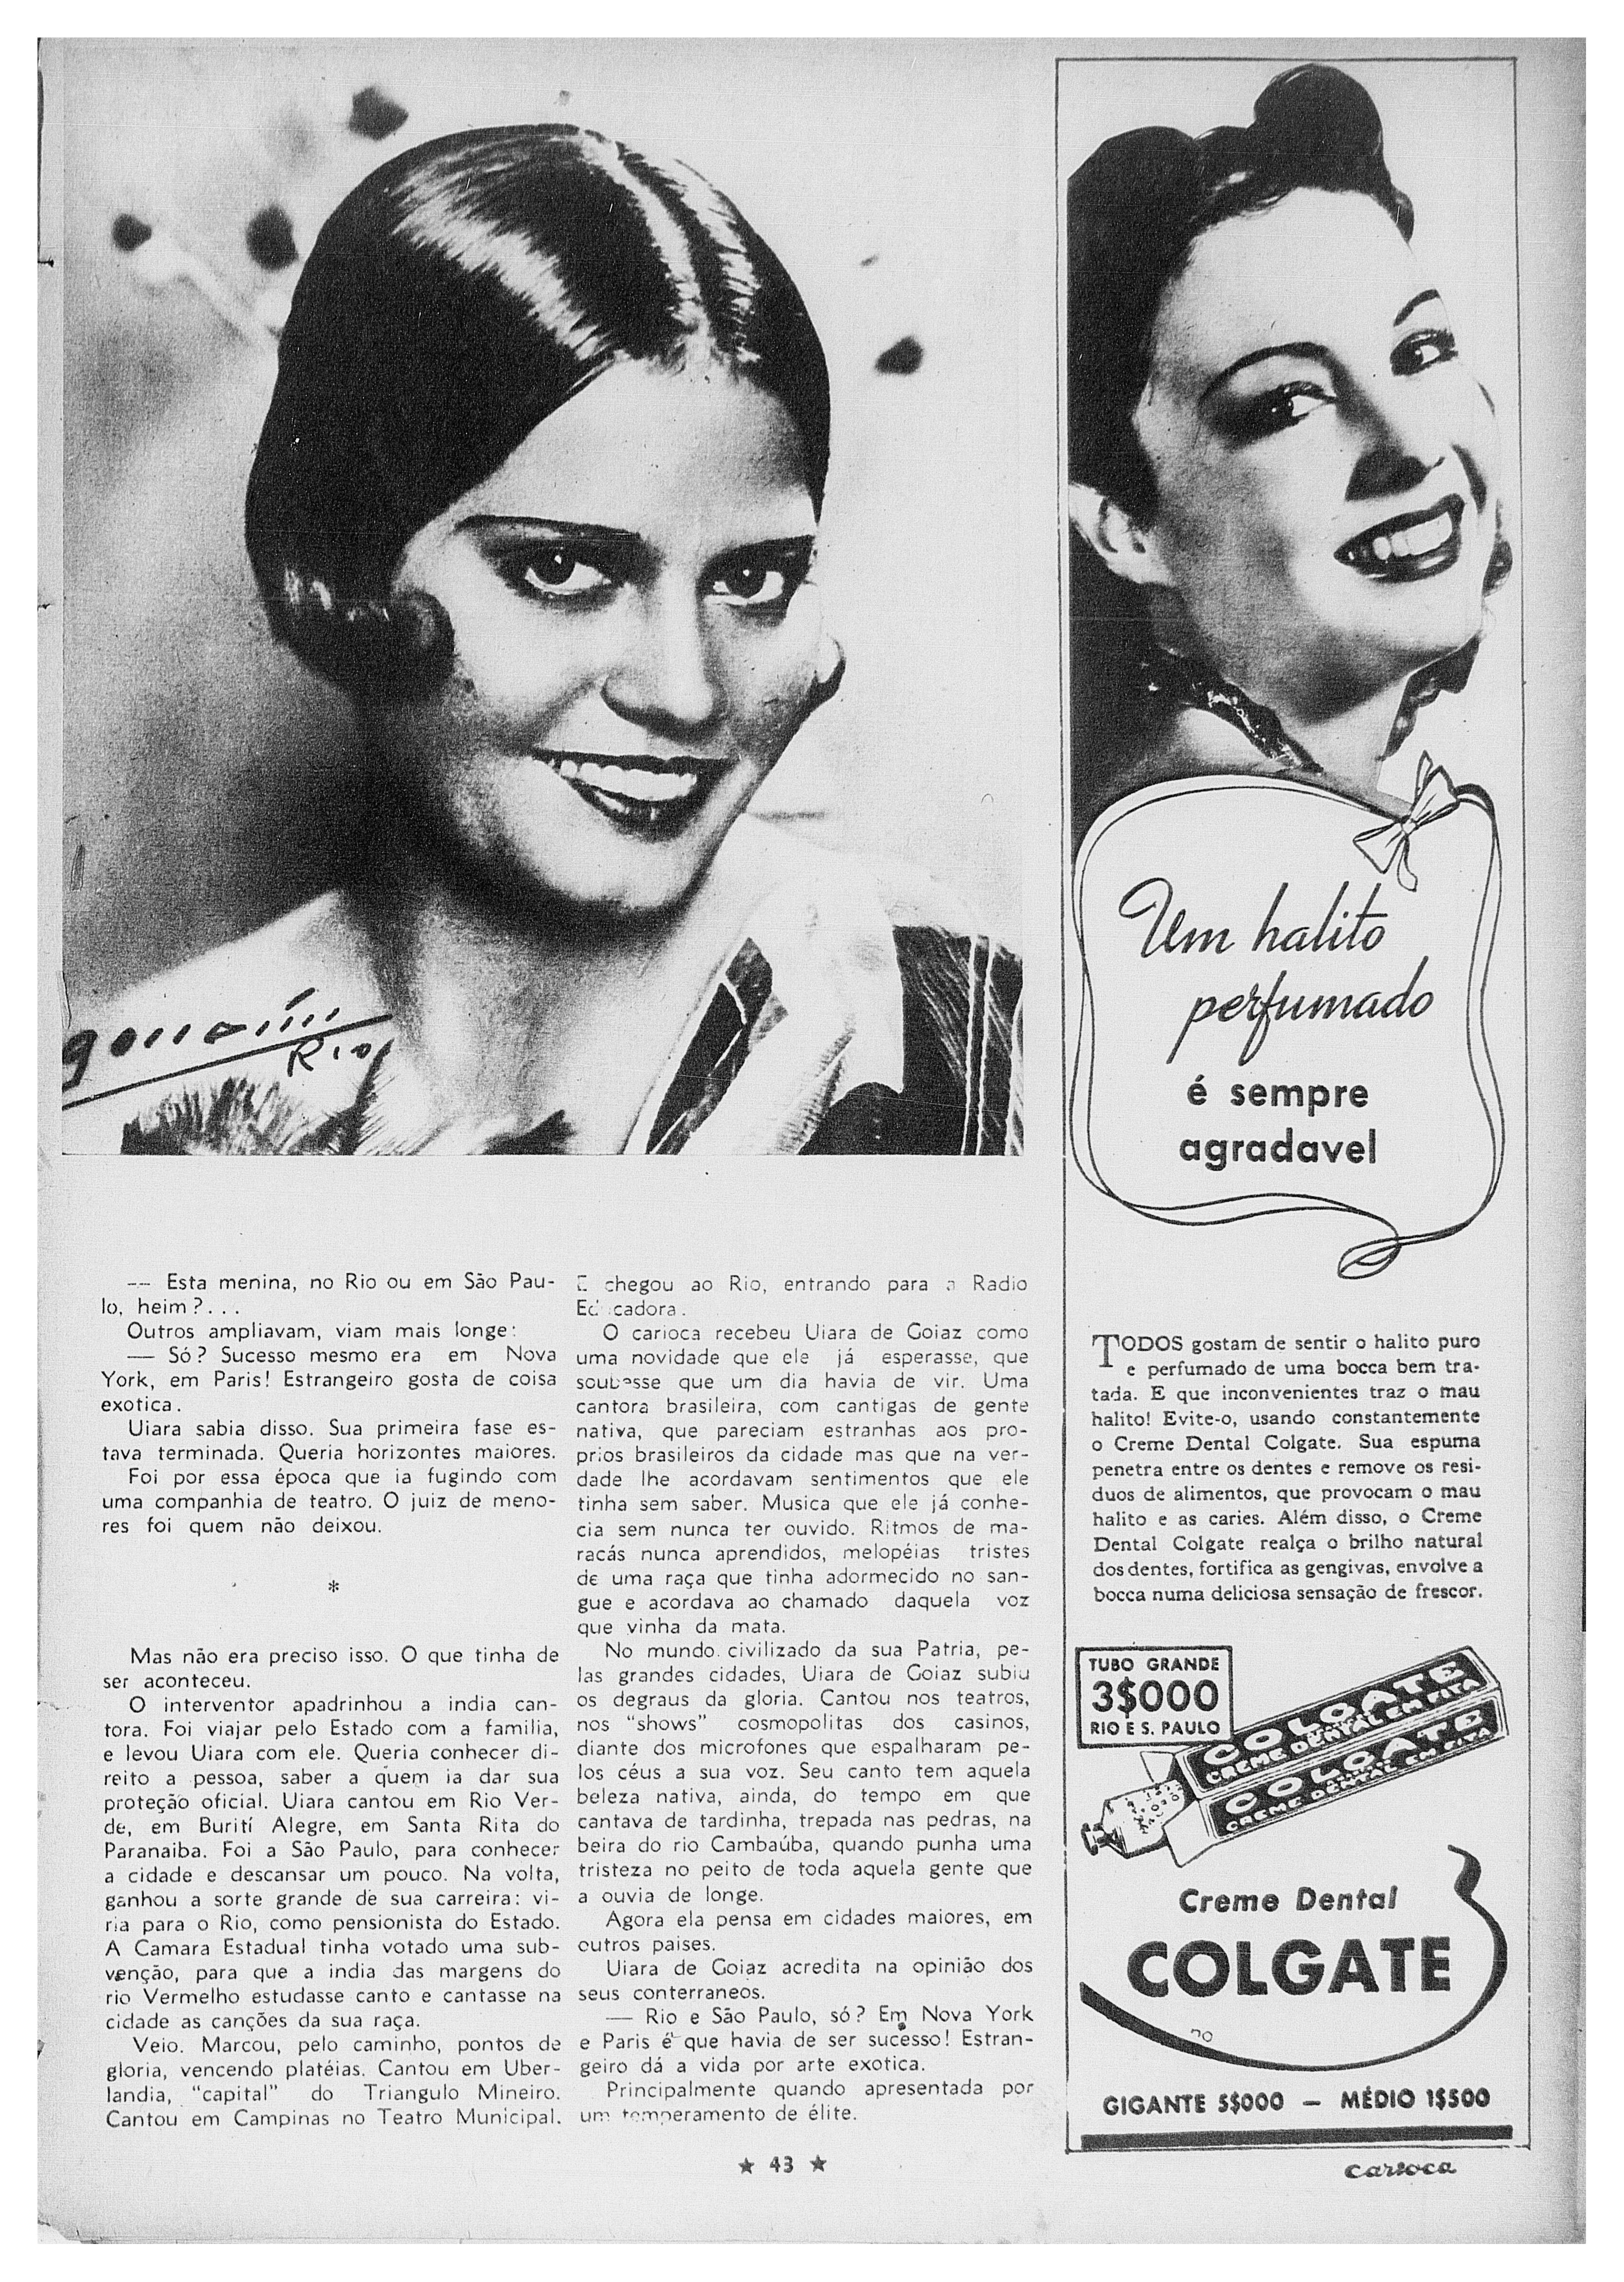 Uyara-1939-02-11_Carioca_02-copy.jpg